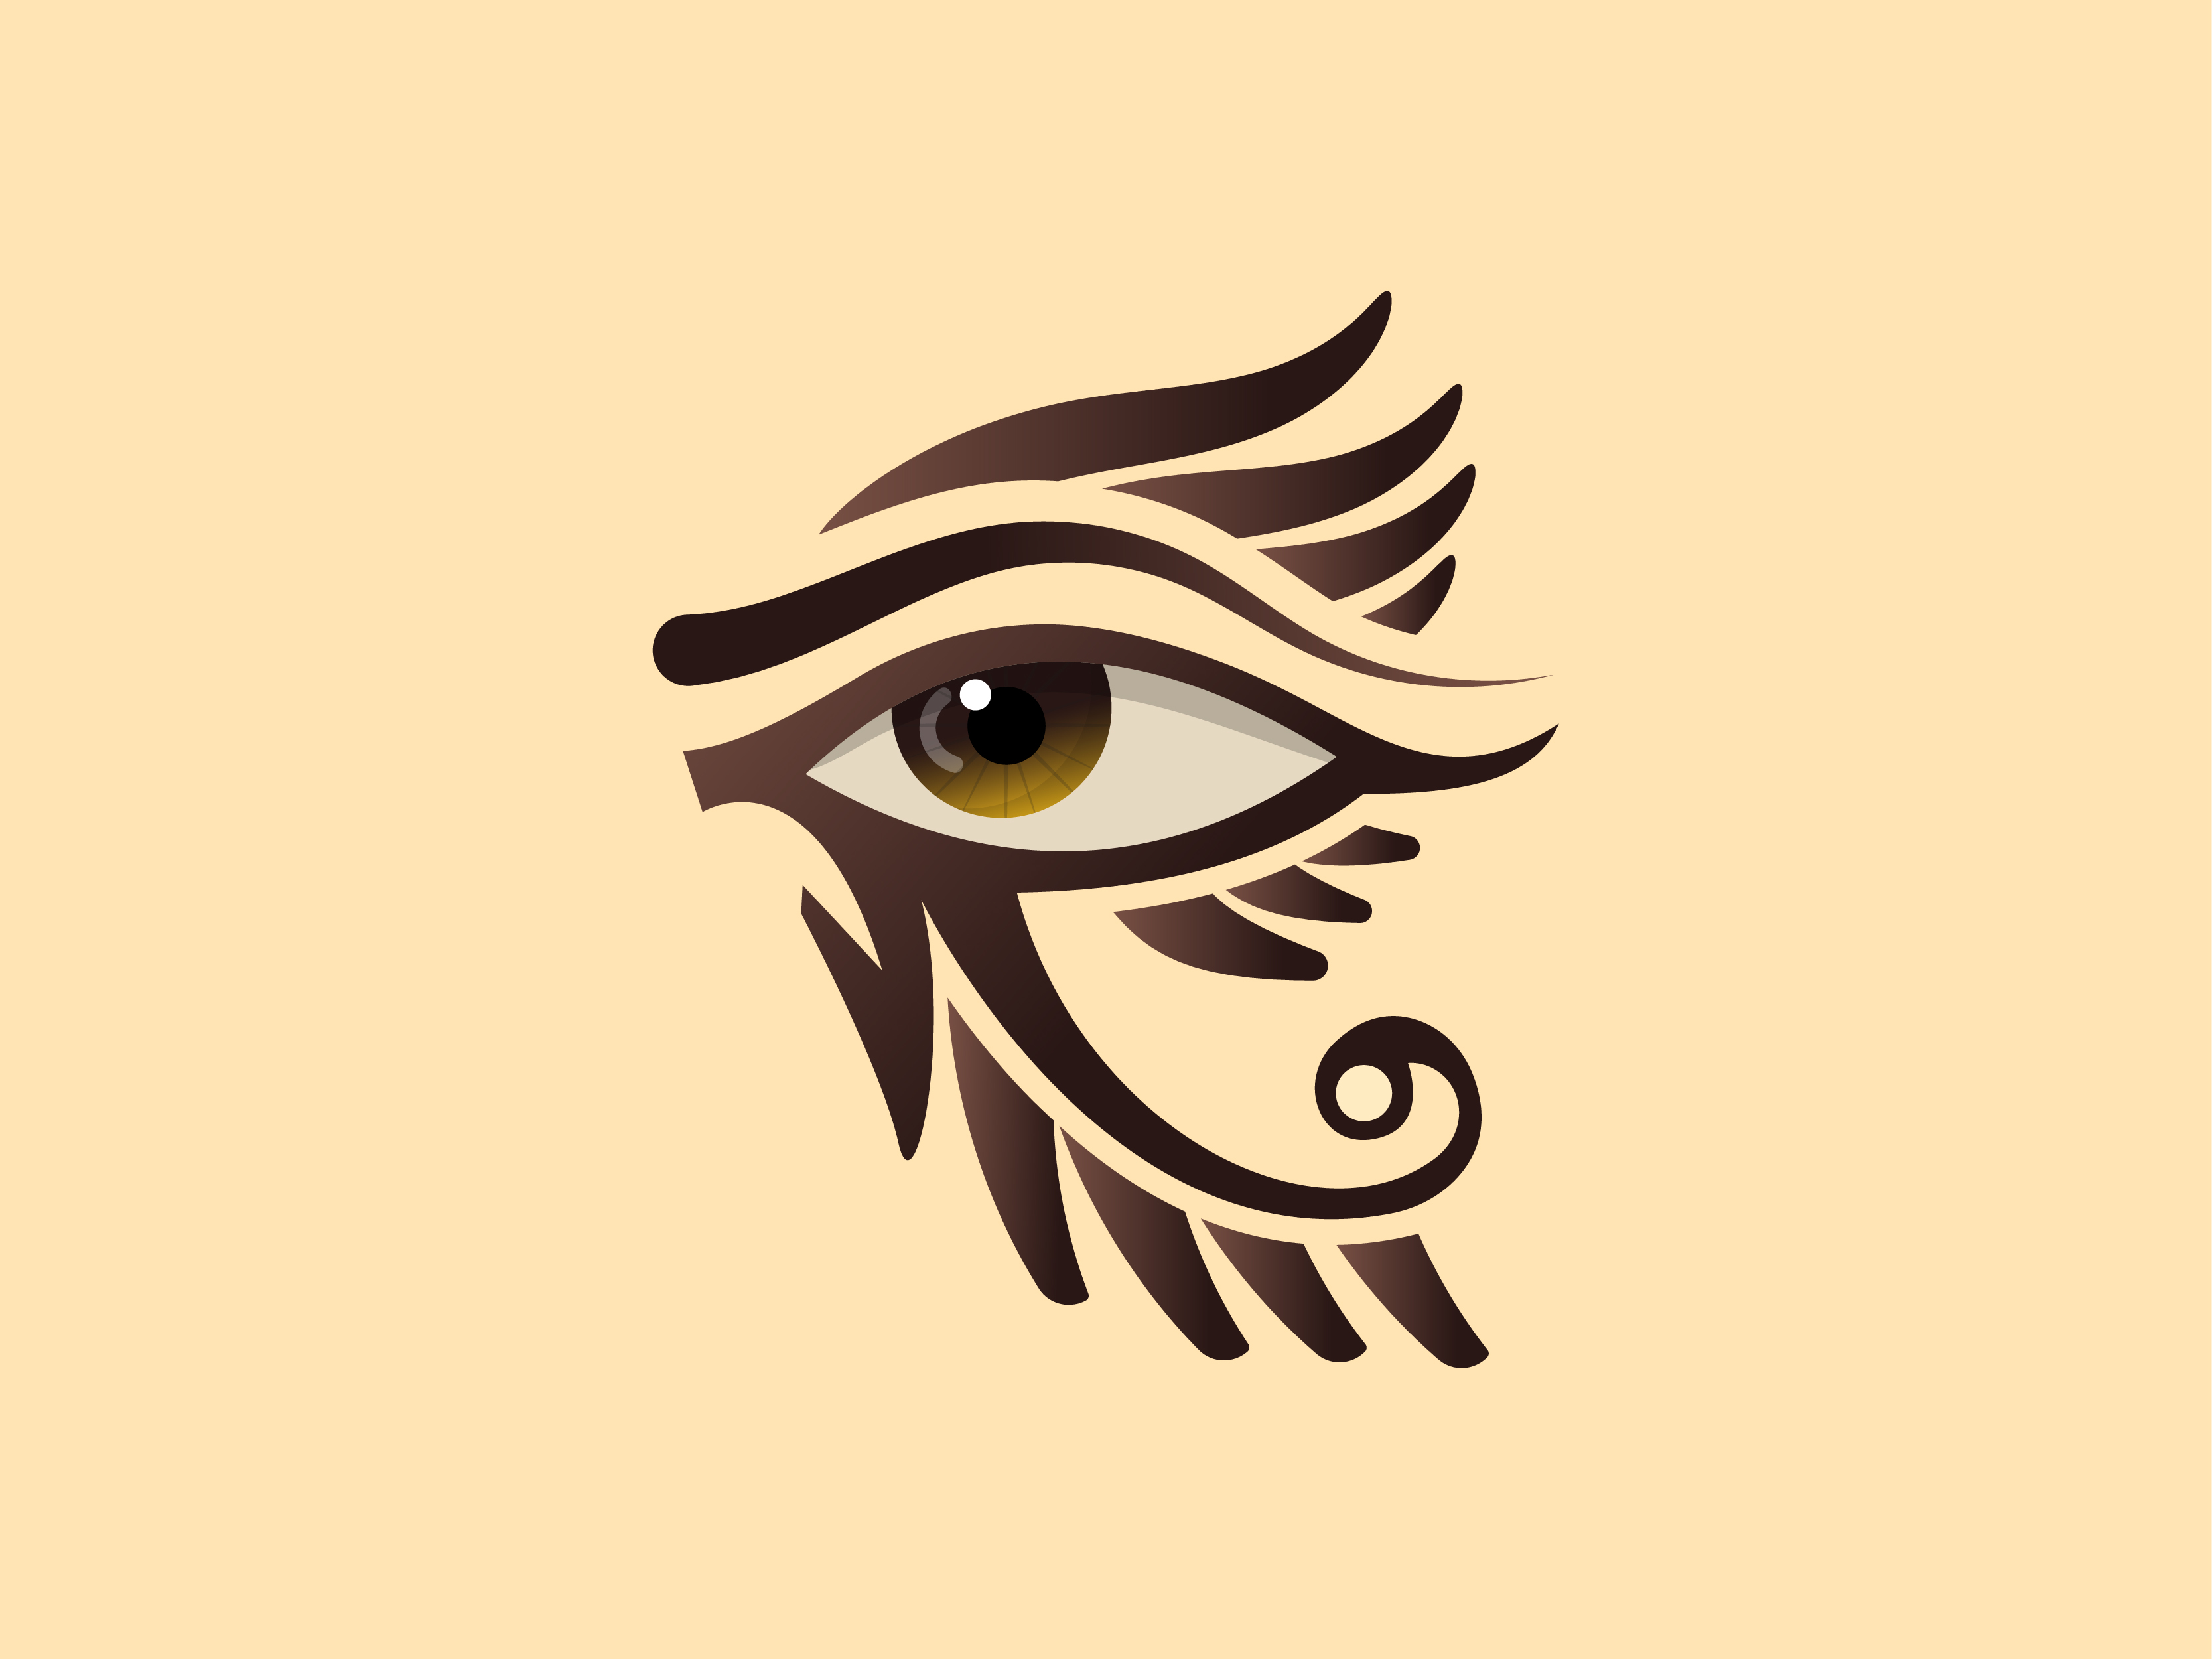 Free Eye of Horus Vector Art